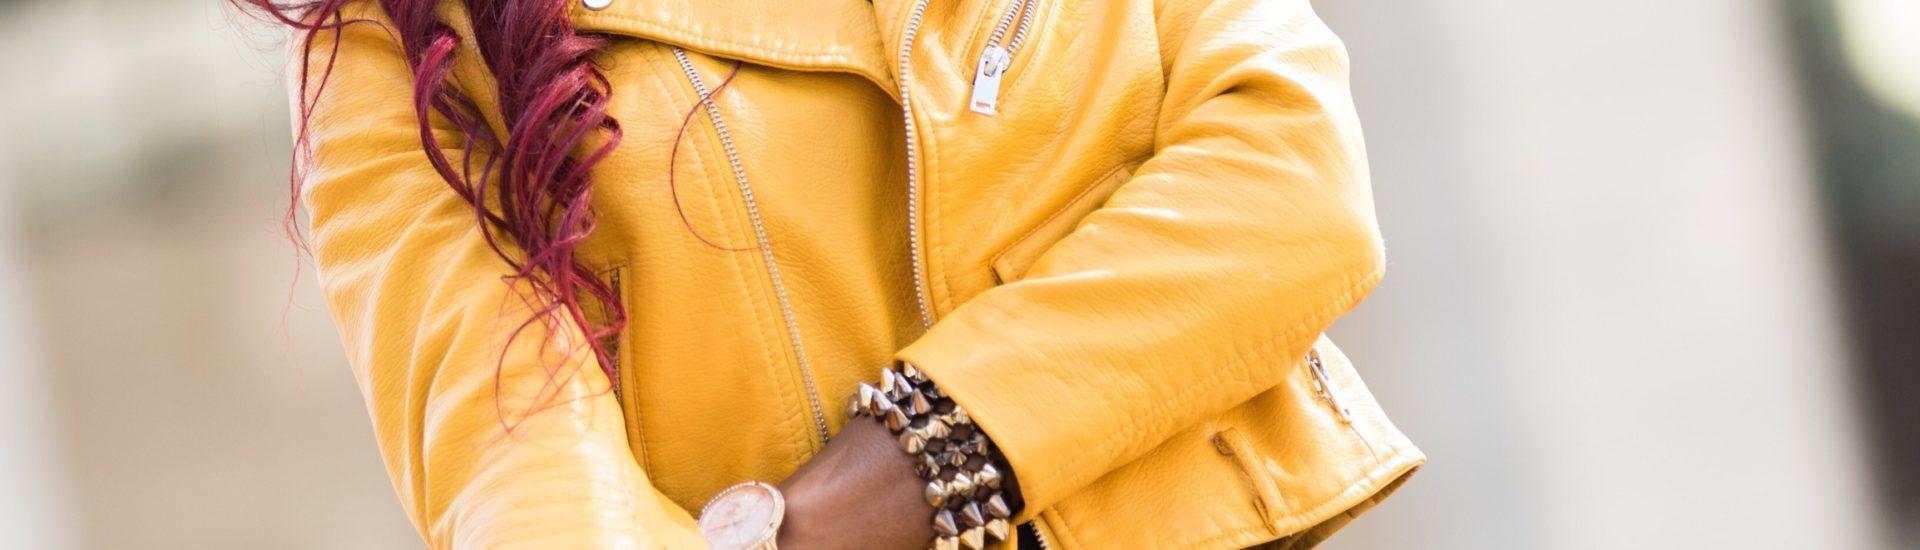 Billykiss Azeez. Your Favourite Muse. Fashion Irish Blogger. African Blogger. SS17. Zara. Aliexpress. Vans. Sunglasses. Bandana.